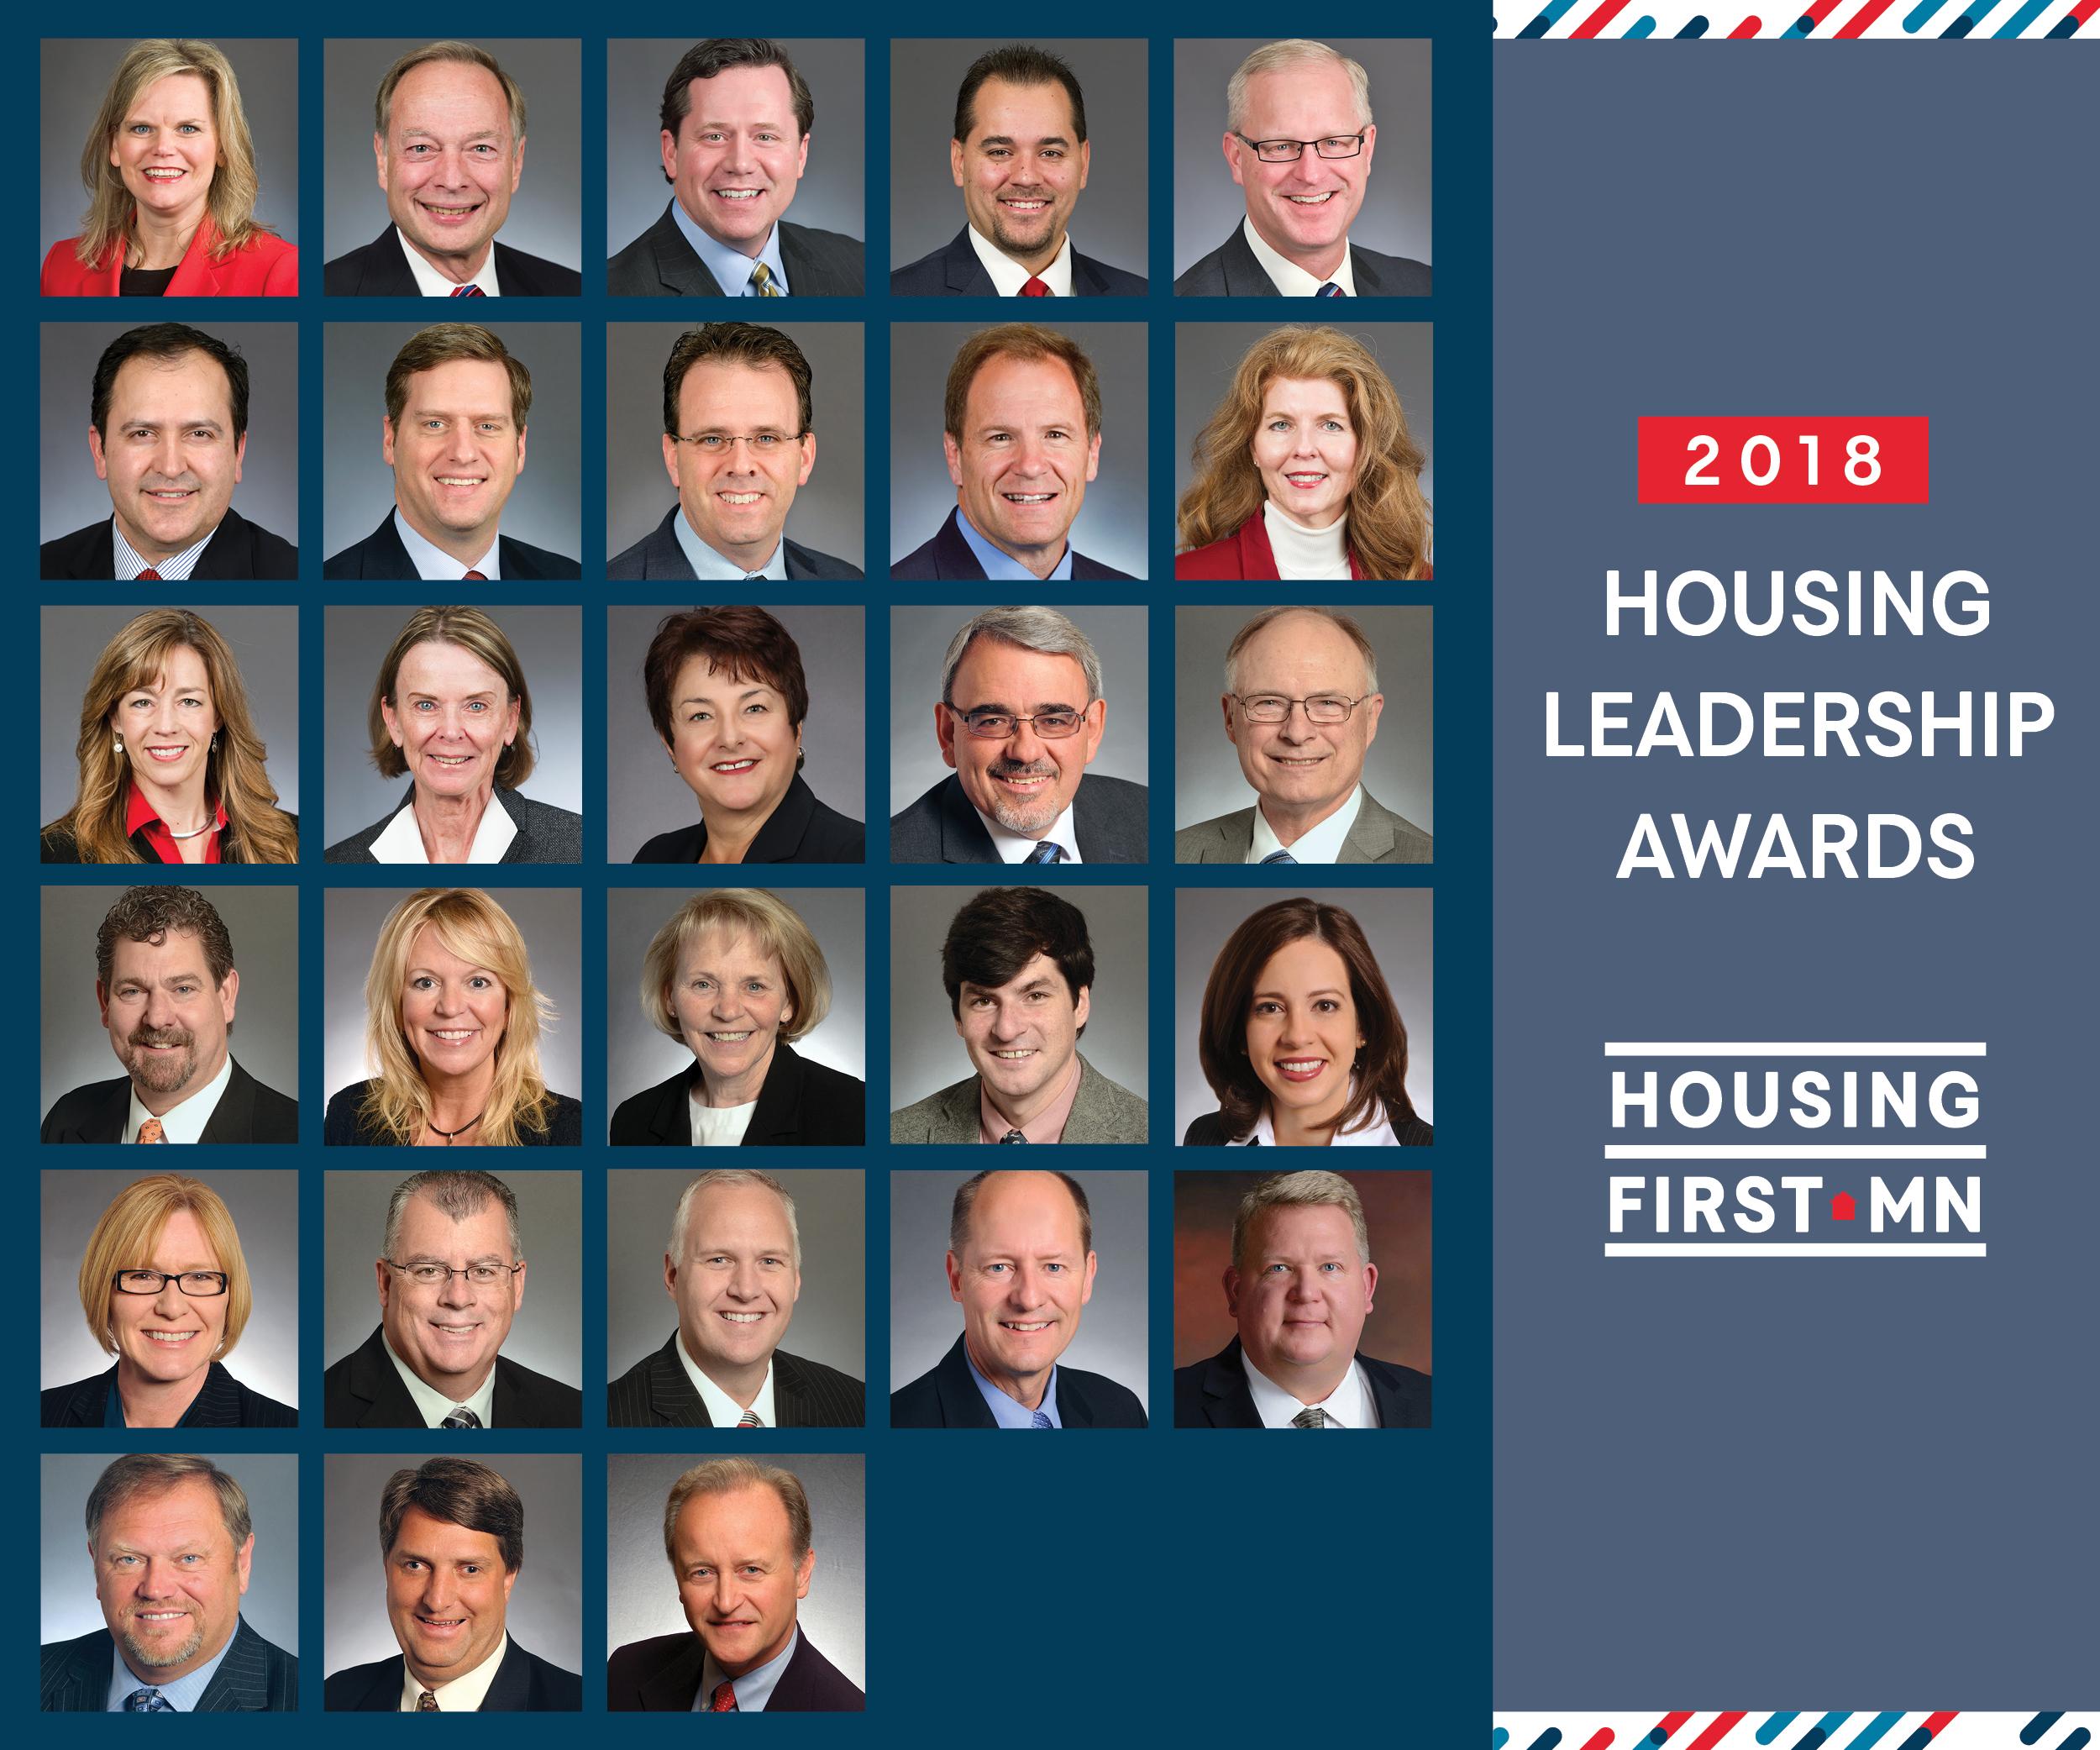 Housing Leadership Awards Collage_18_Square-300.jpg